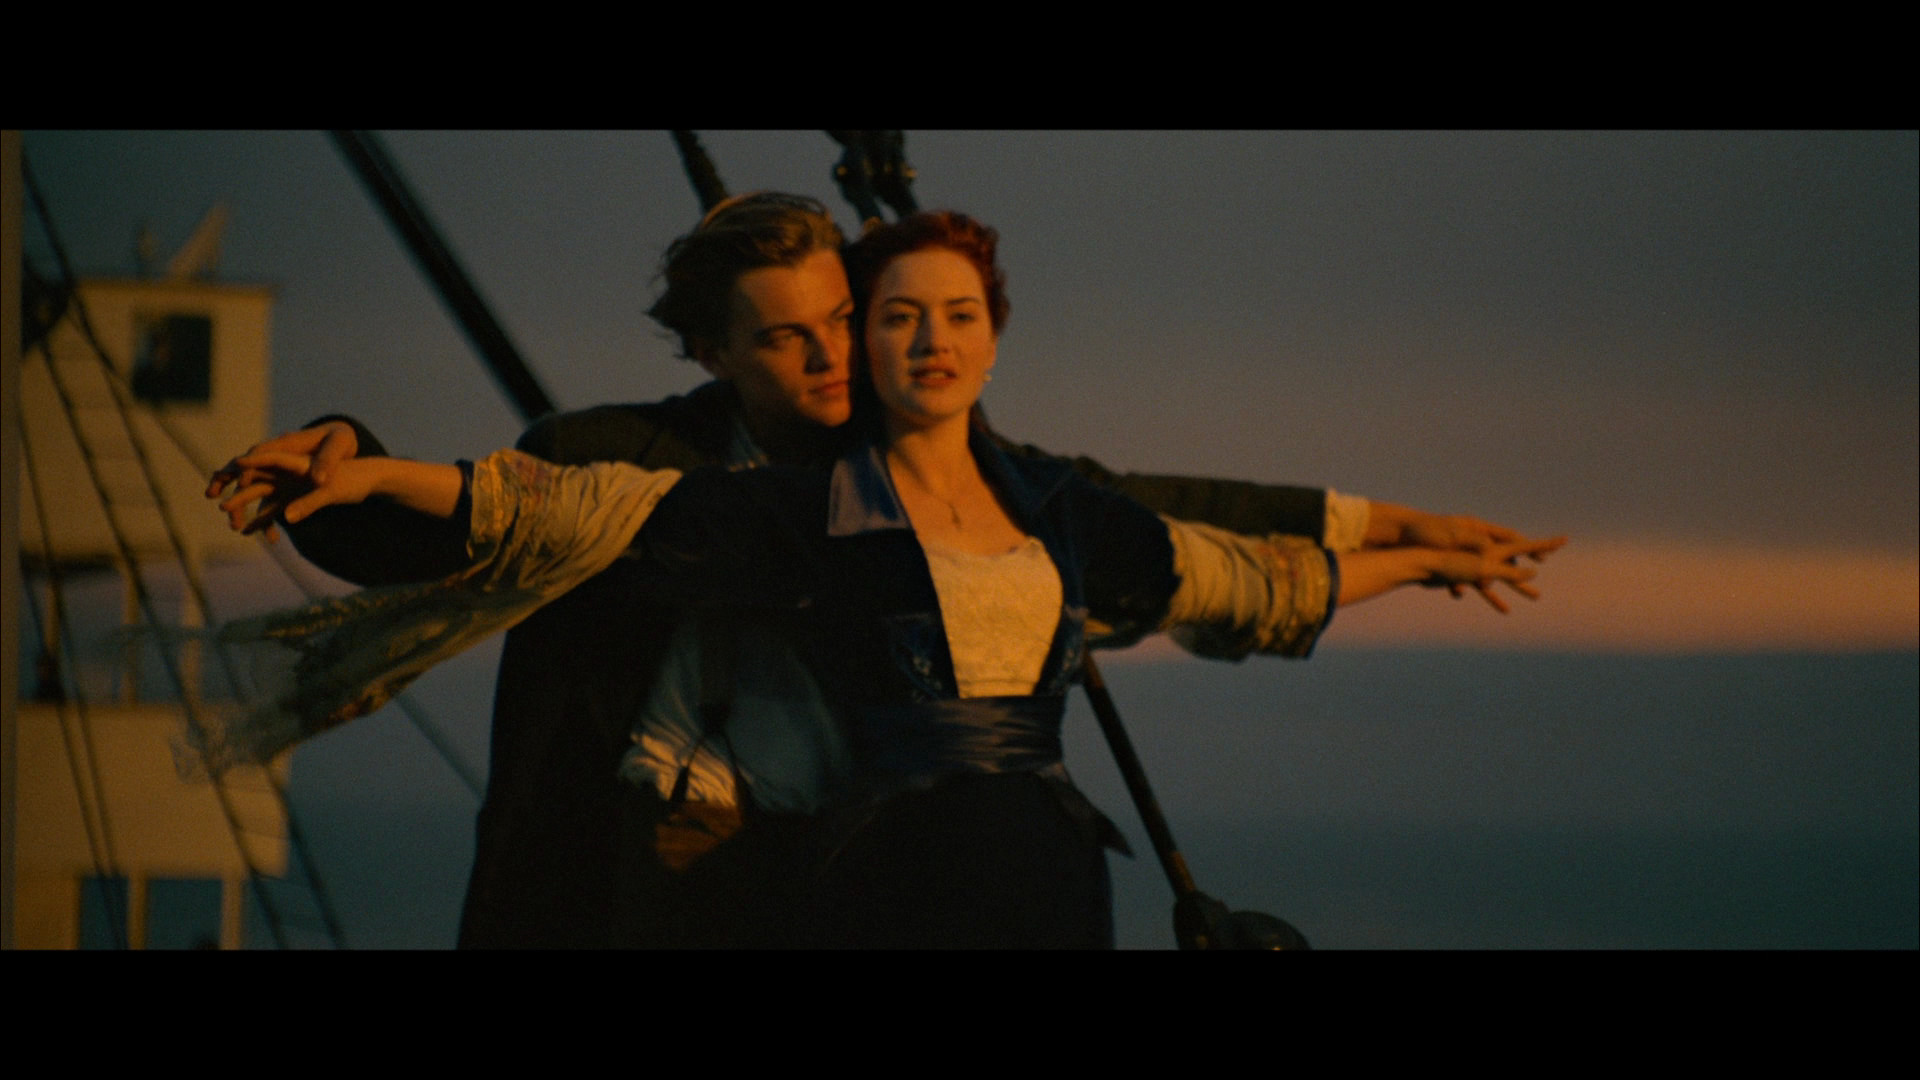 Titanic Movie Trailer and Videos